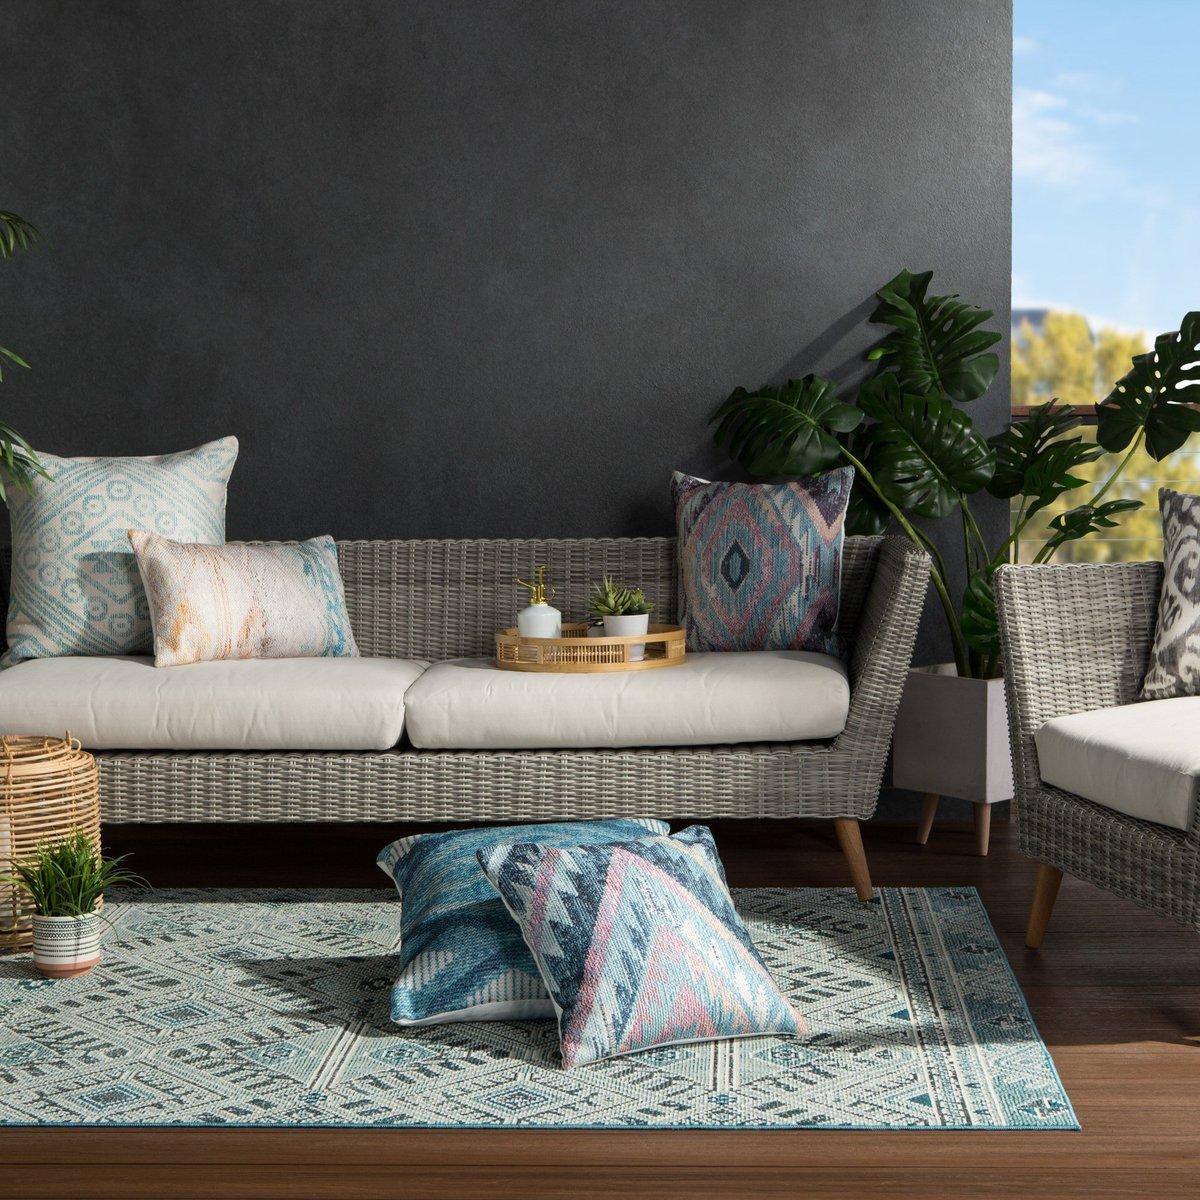 Calming Colors - Boho Outdoor Living Room Decor Ideas